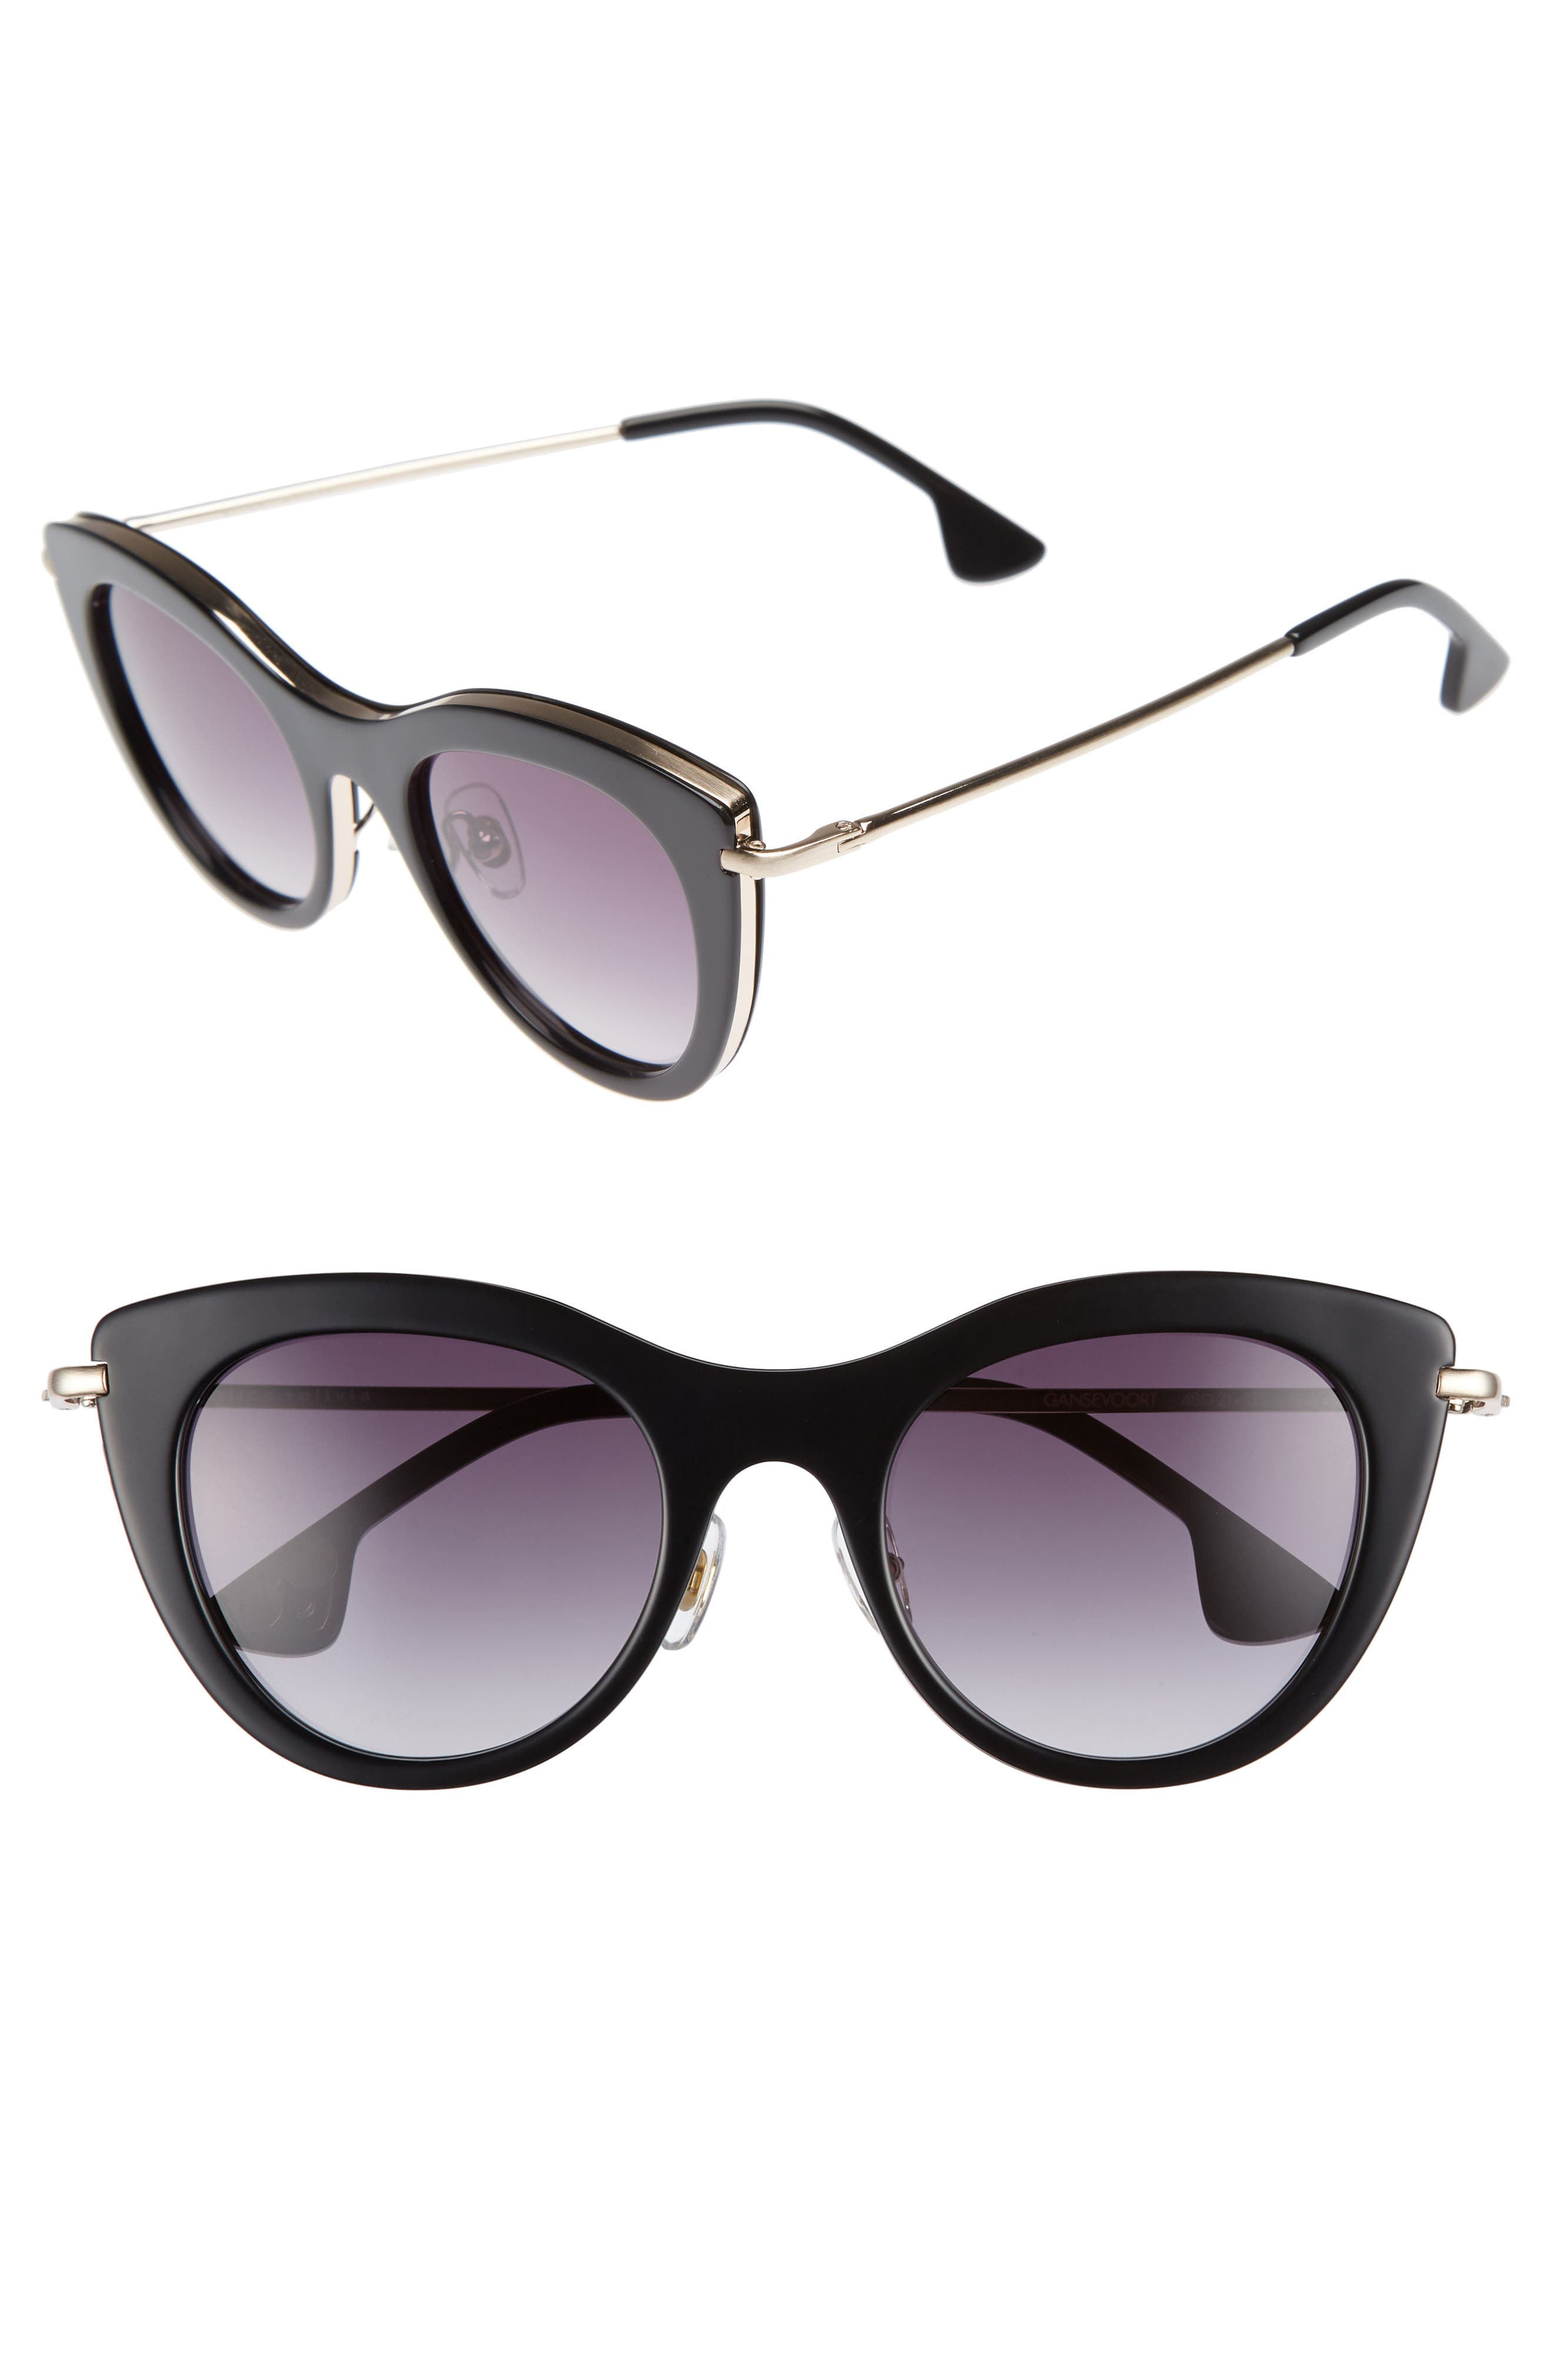 Gansevoort 48mm Special Fit Cat Eye Sunglasses,                         Main,                         color, 001